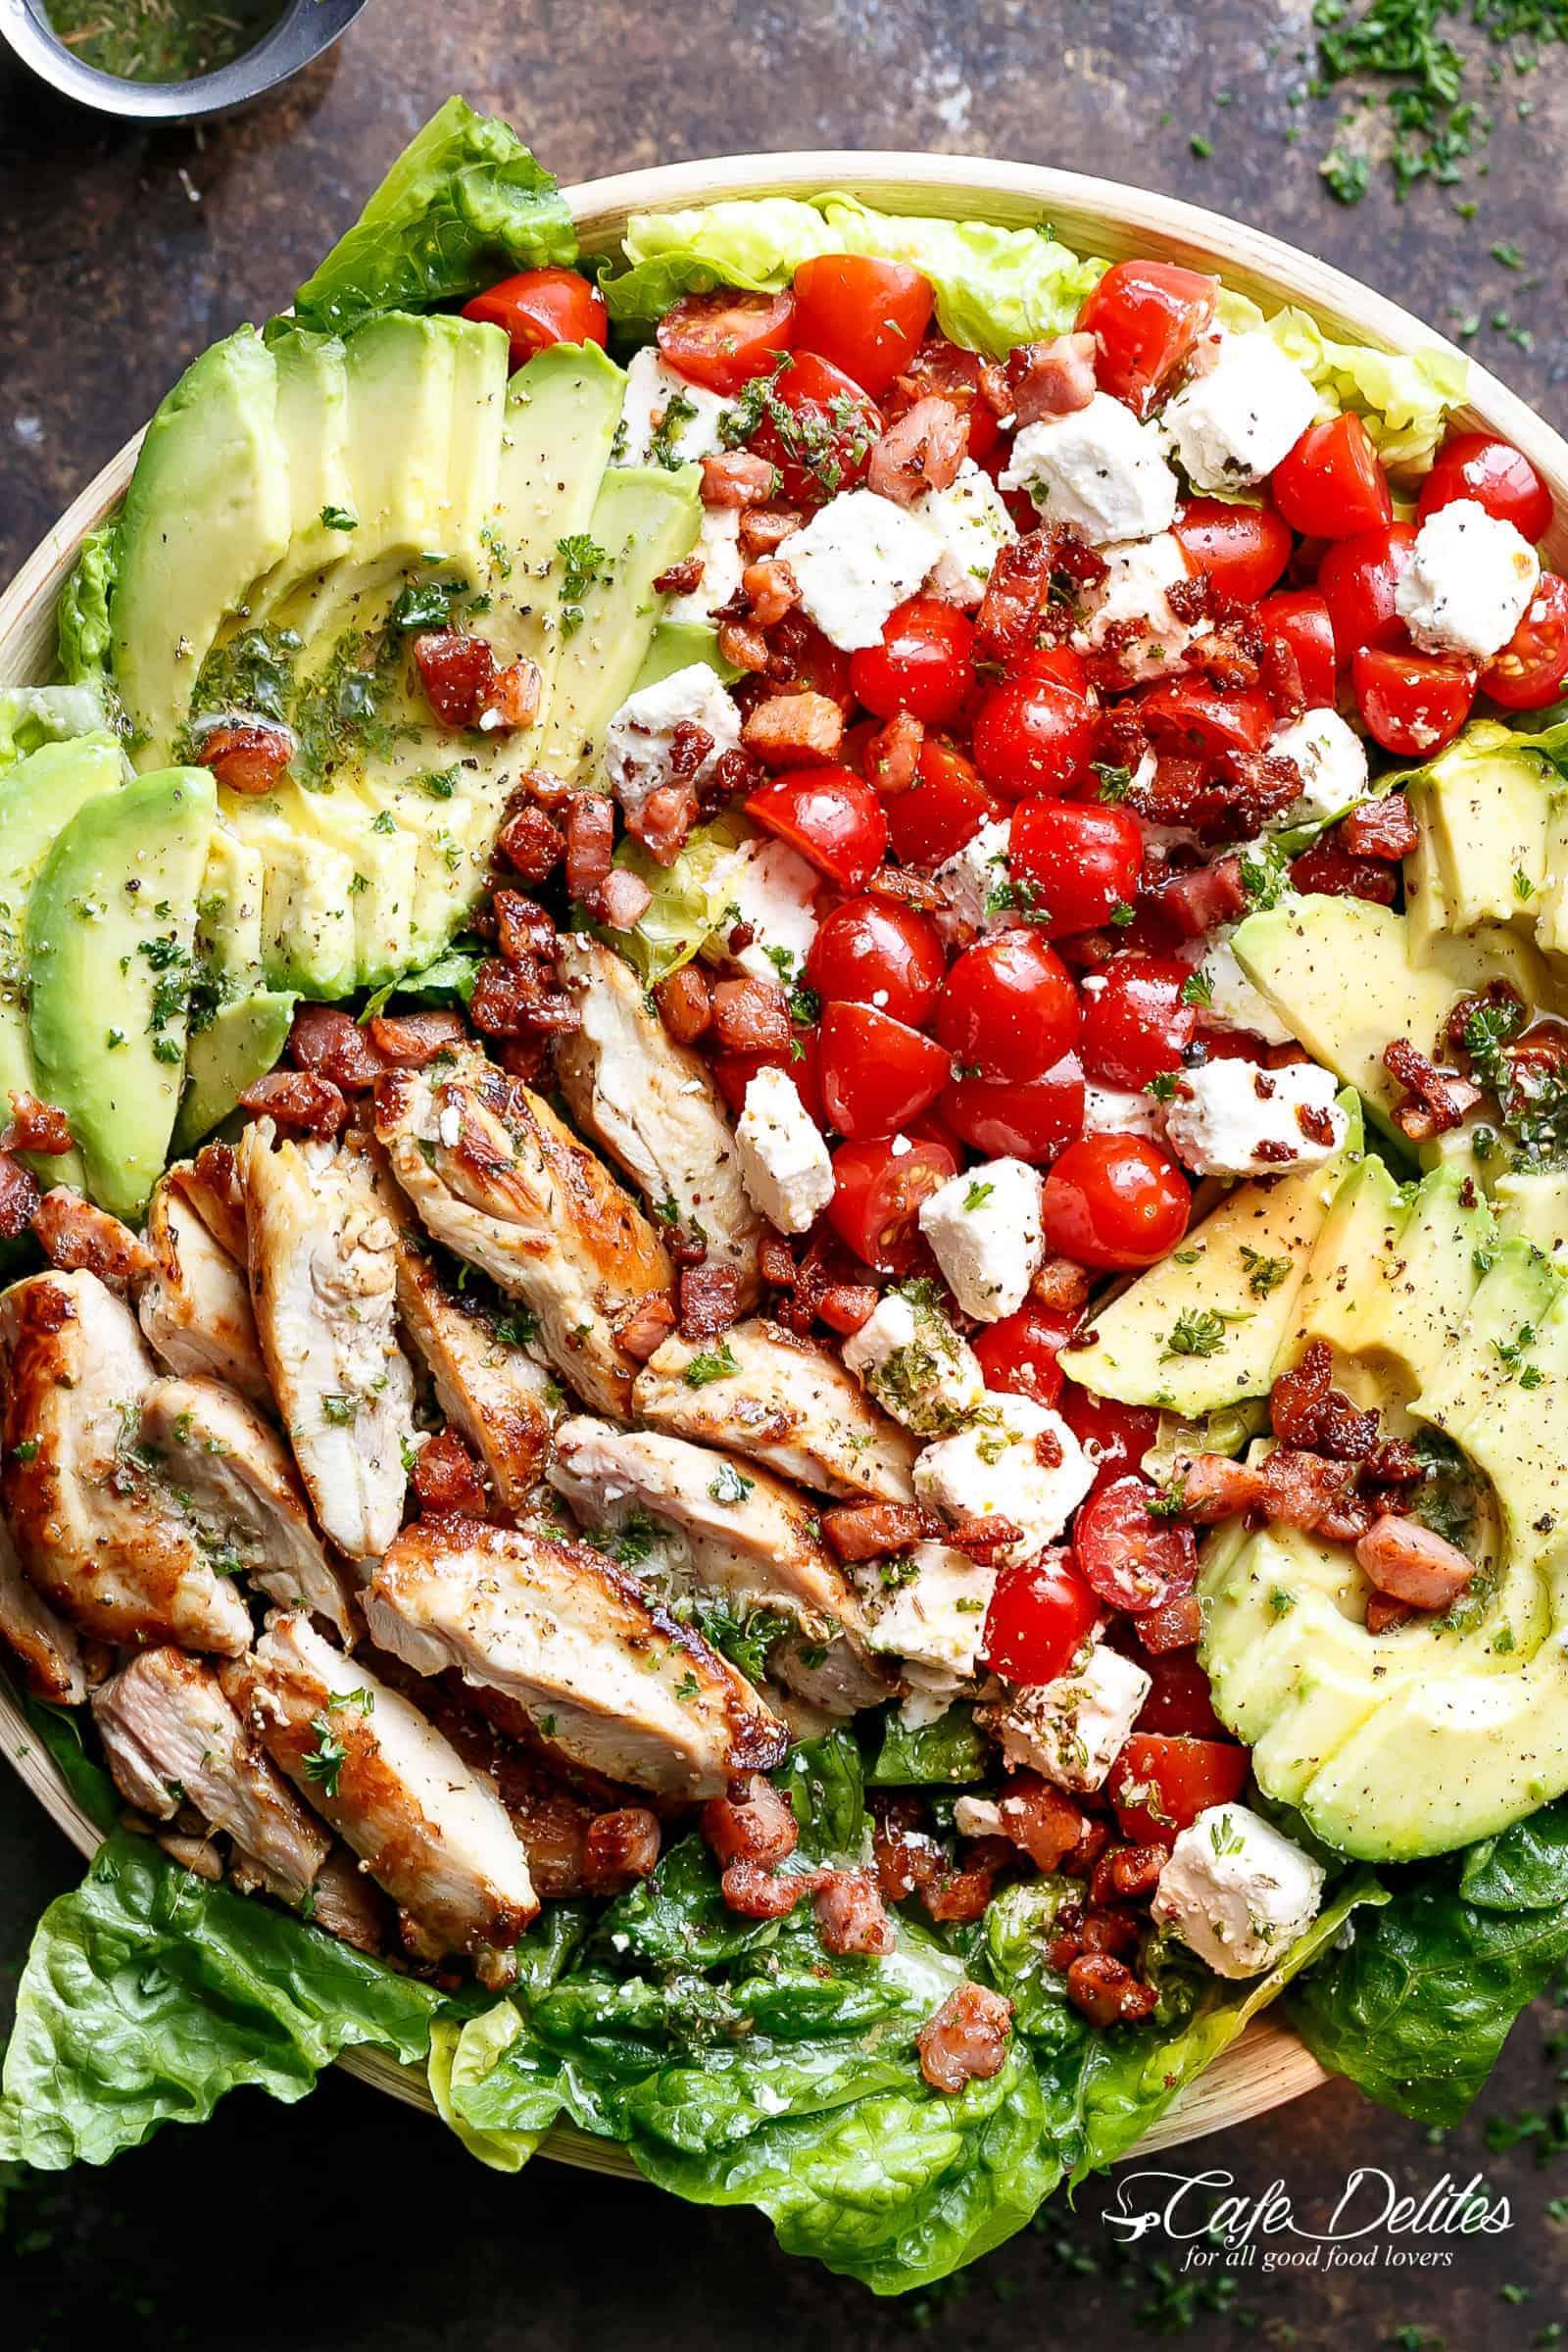 Lemon Herb Avocado Chicken Salad